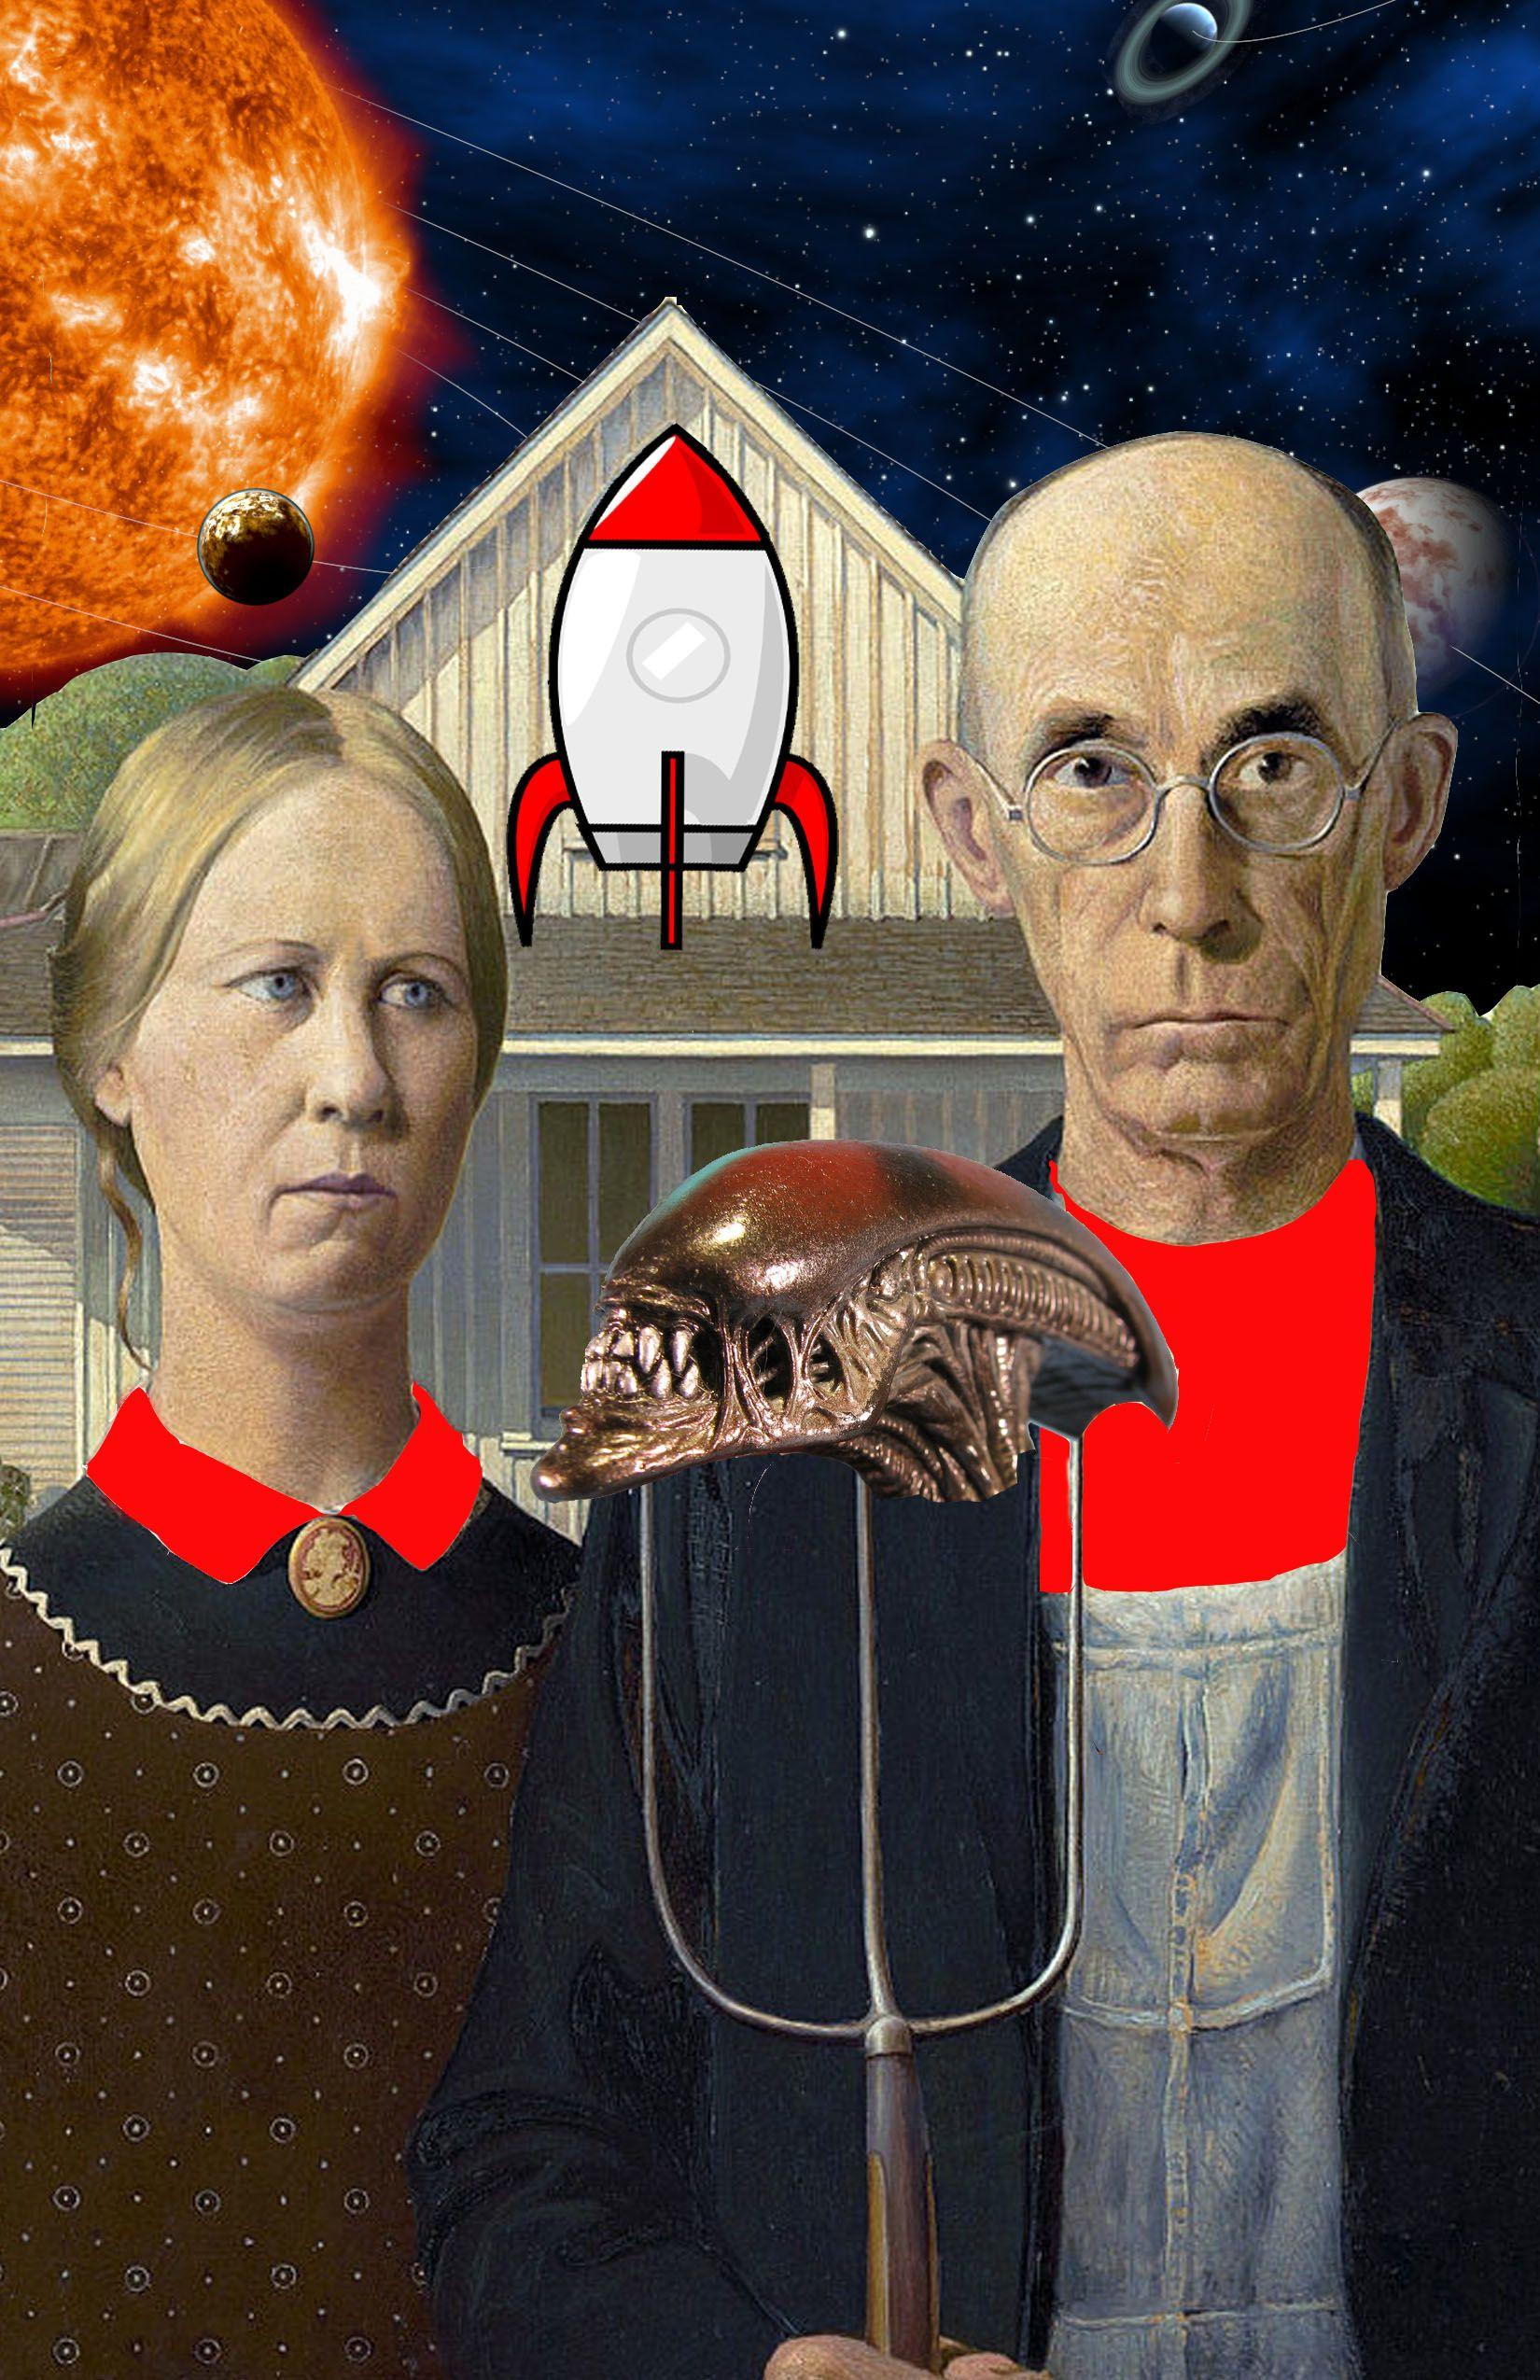 Alien gothic american gothic parody american gothic